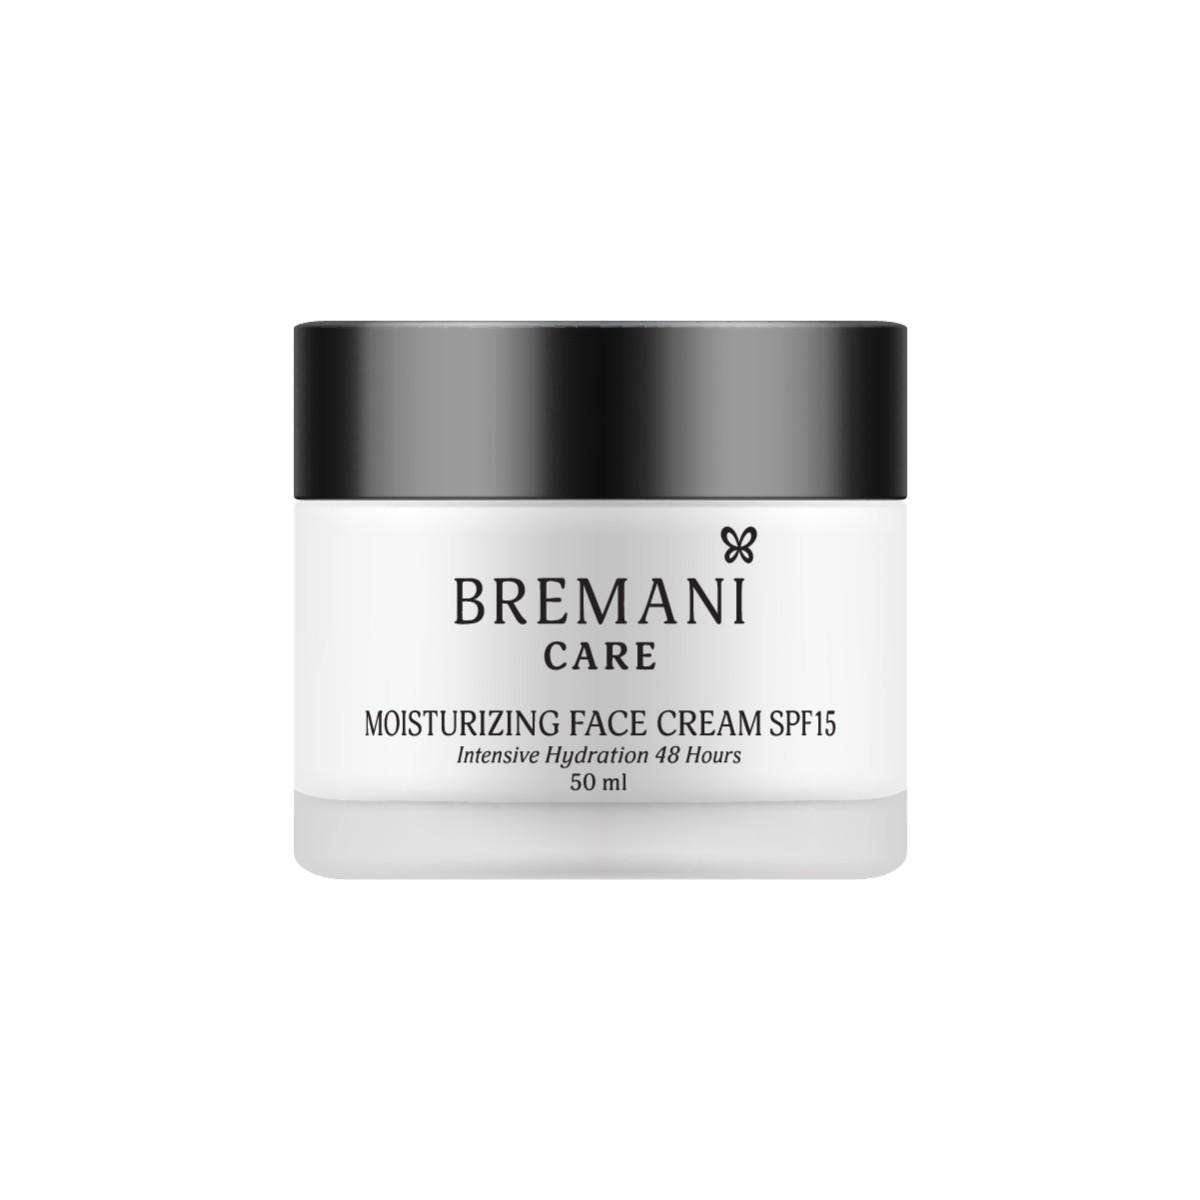 Moisturizing Face Cream. Intensive Hydration 48 Hours. SPF15